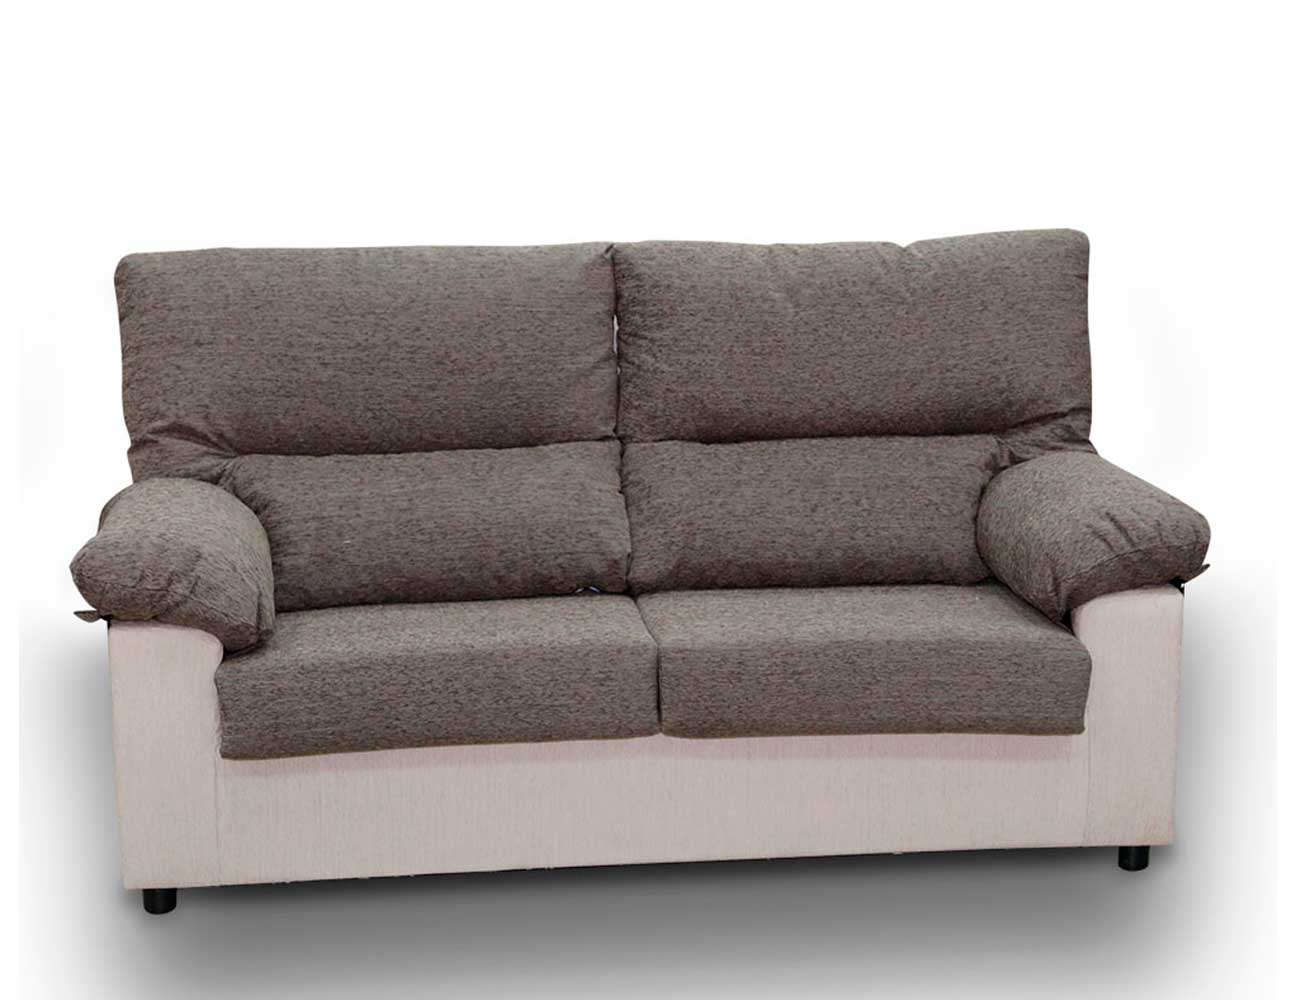 Sofa 3 plazas barato23